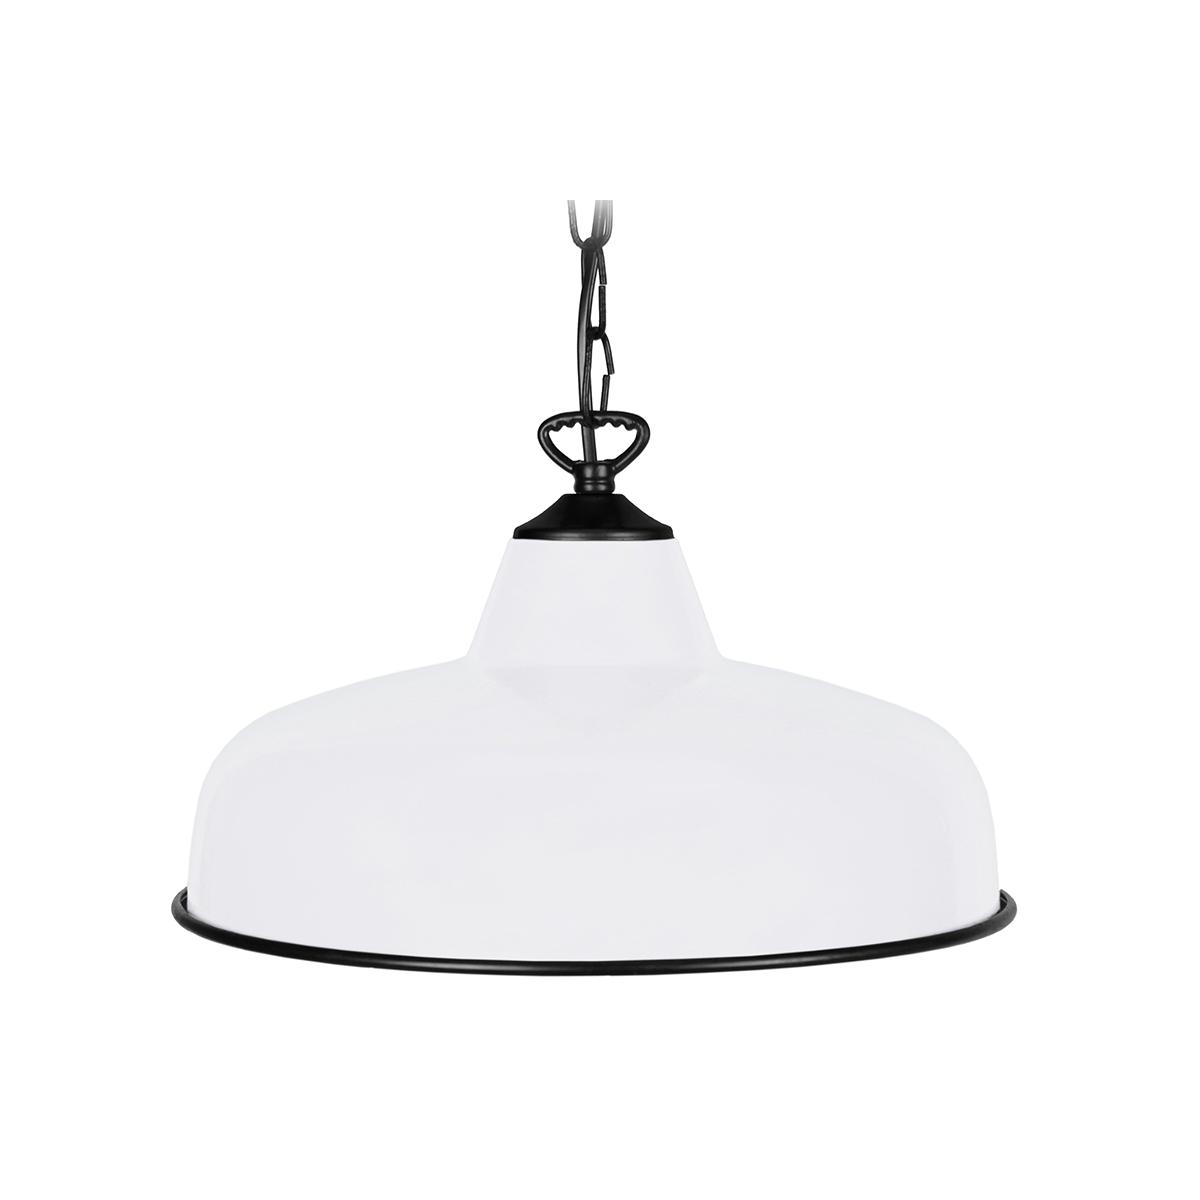 Lampadario design in metallo Bianco VINTI